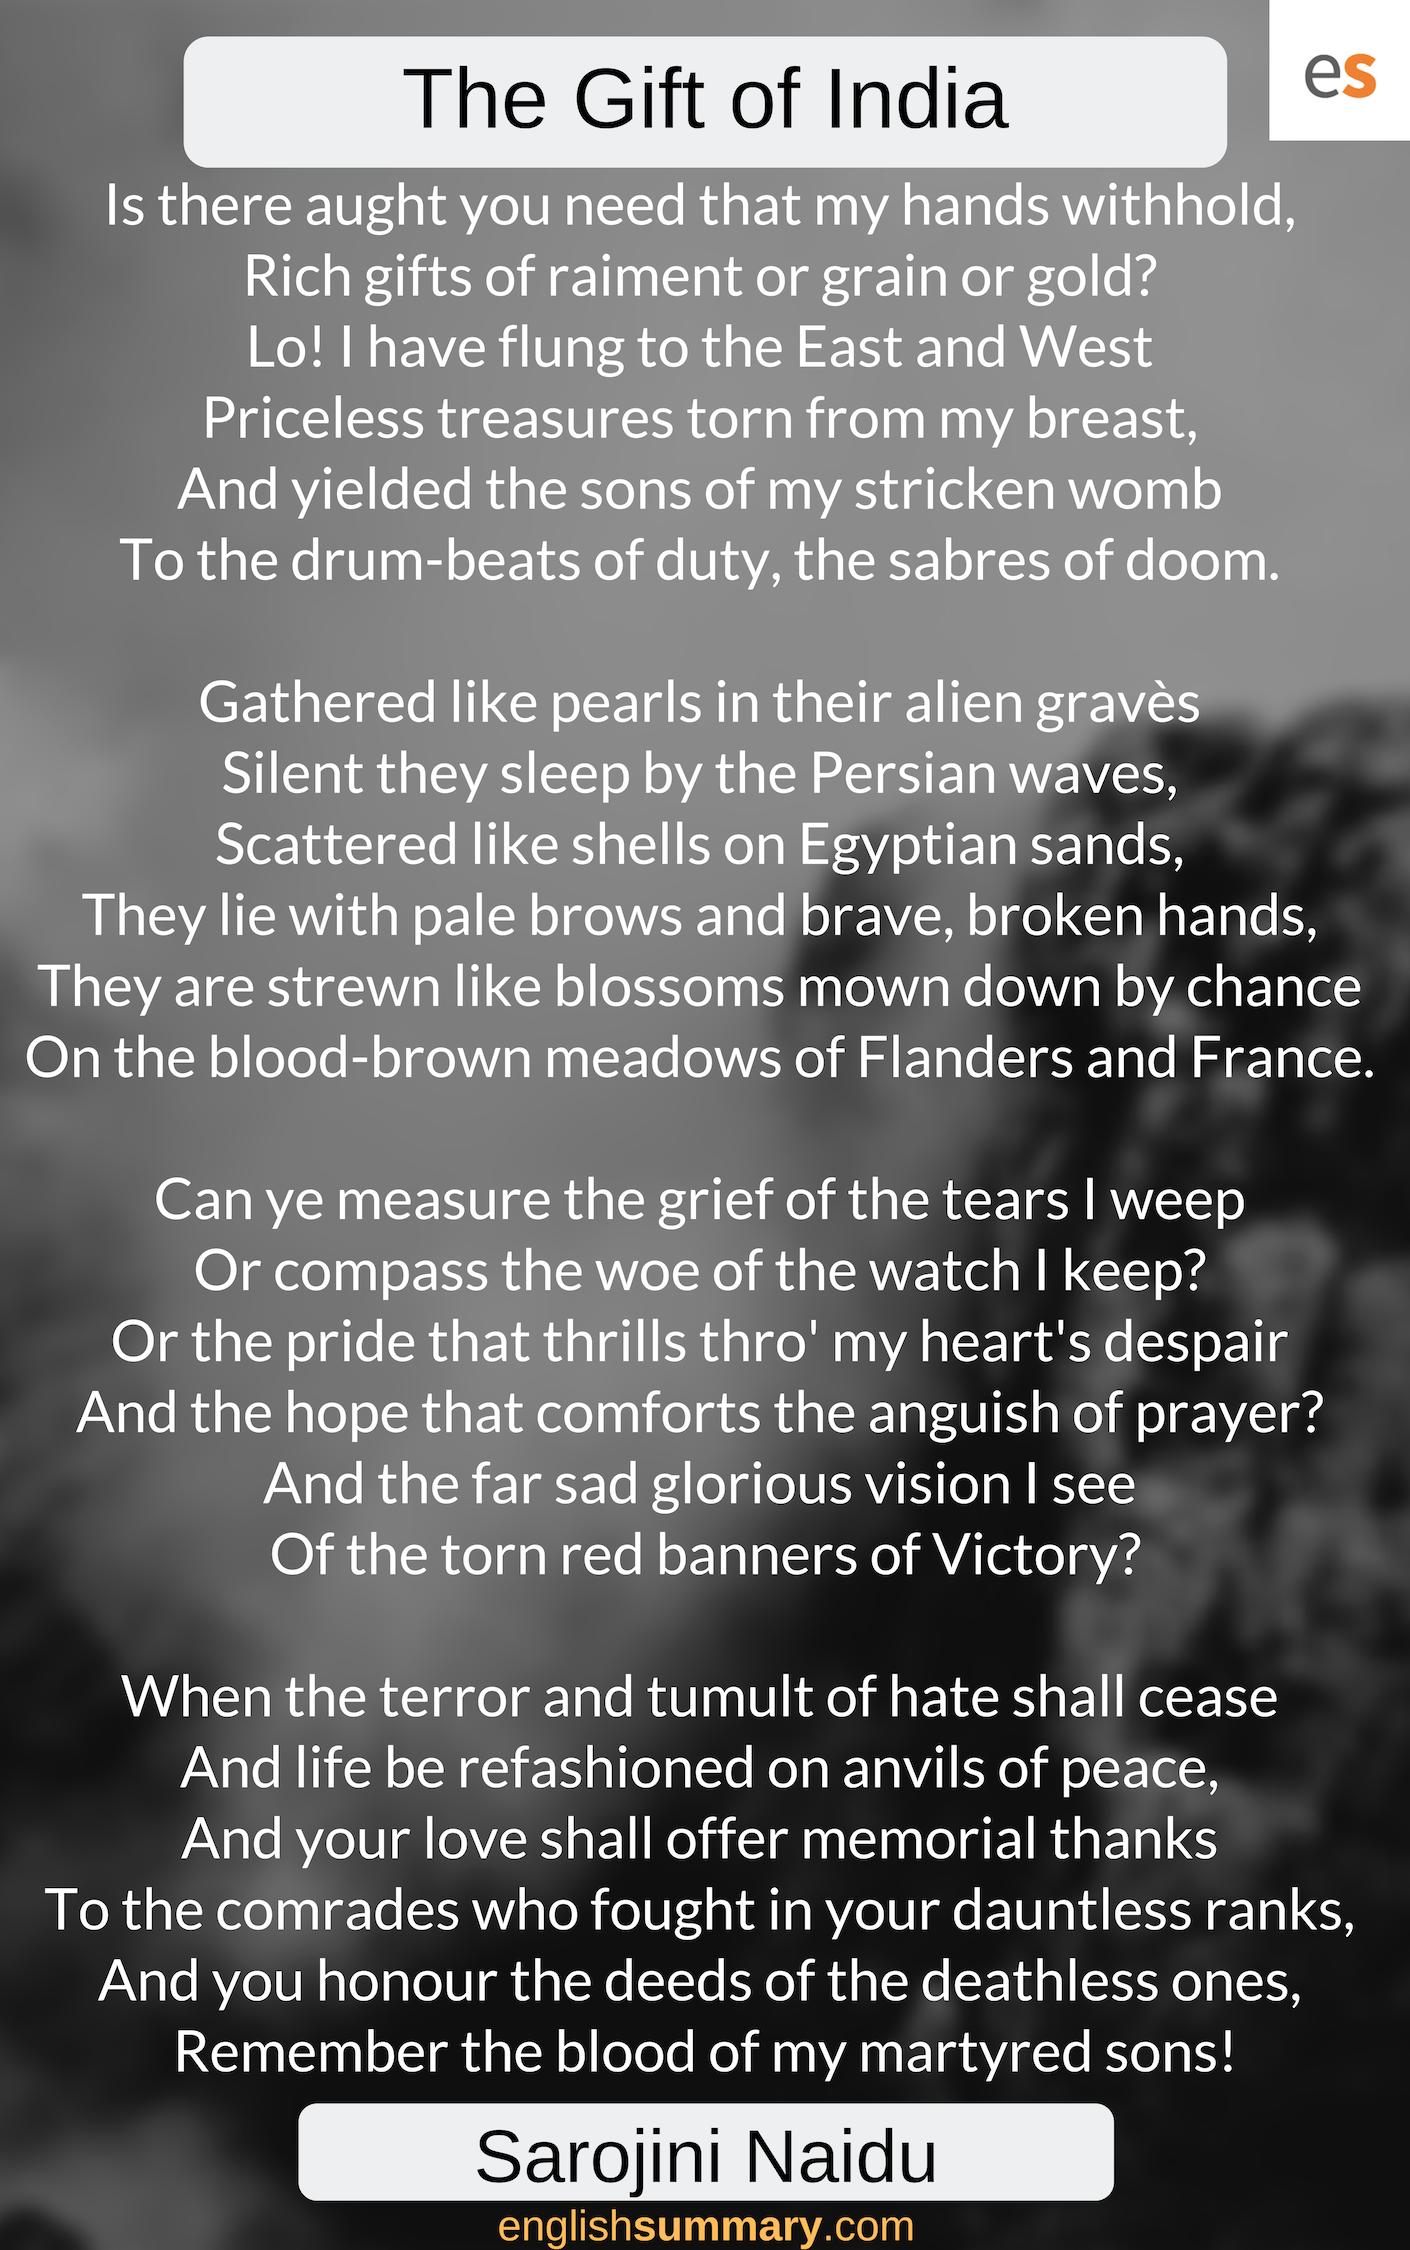 The Gift Of India Poem By Sarojini Naidu Patriotic In English Dawn Awake Explanation